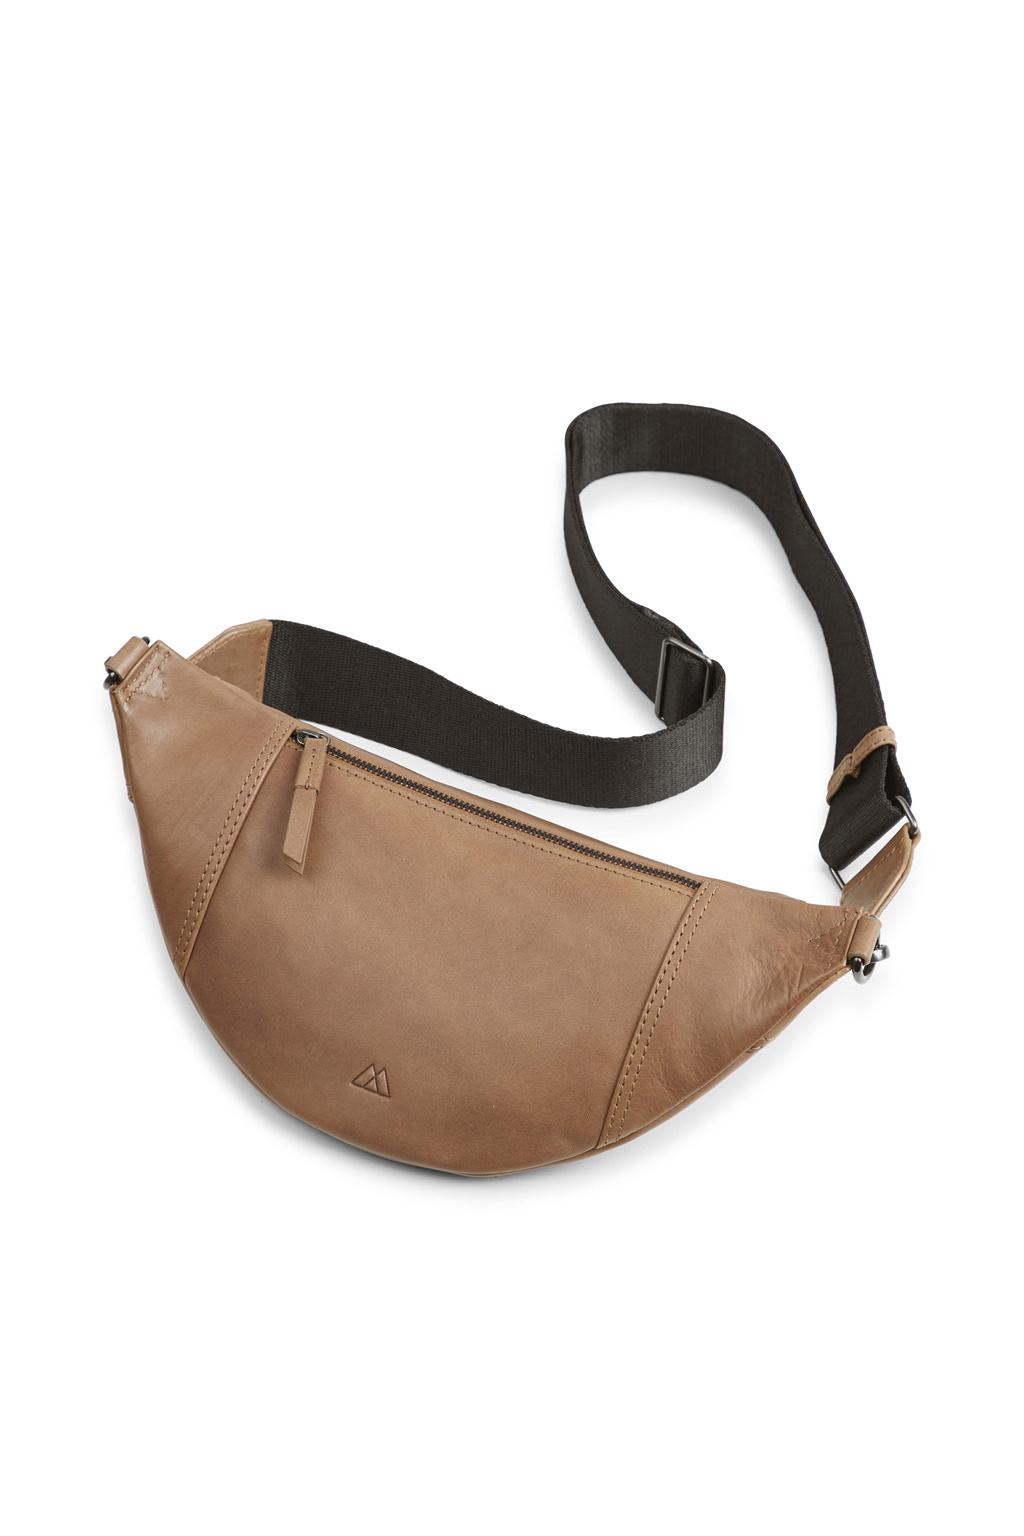 Elinor Bum Bag - Antique Caramel w/ Black-3